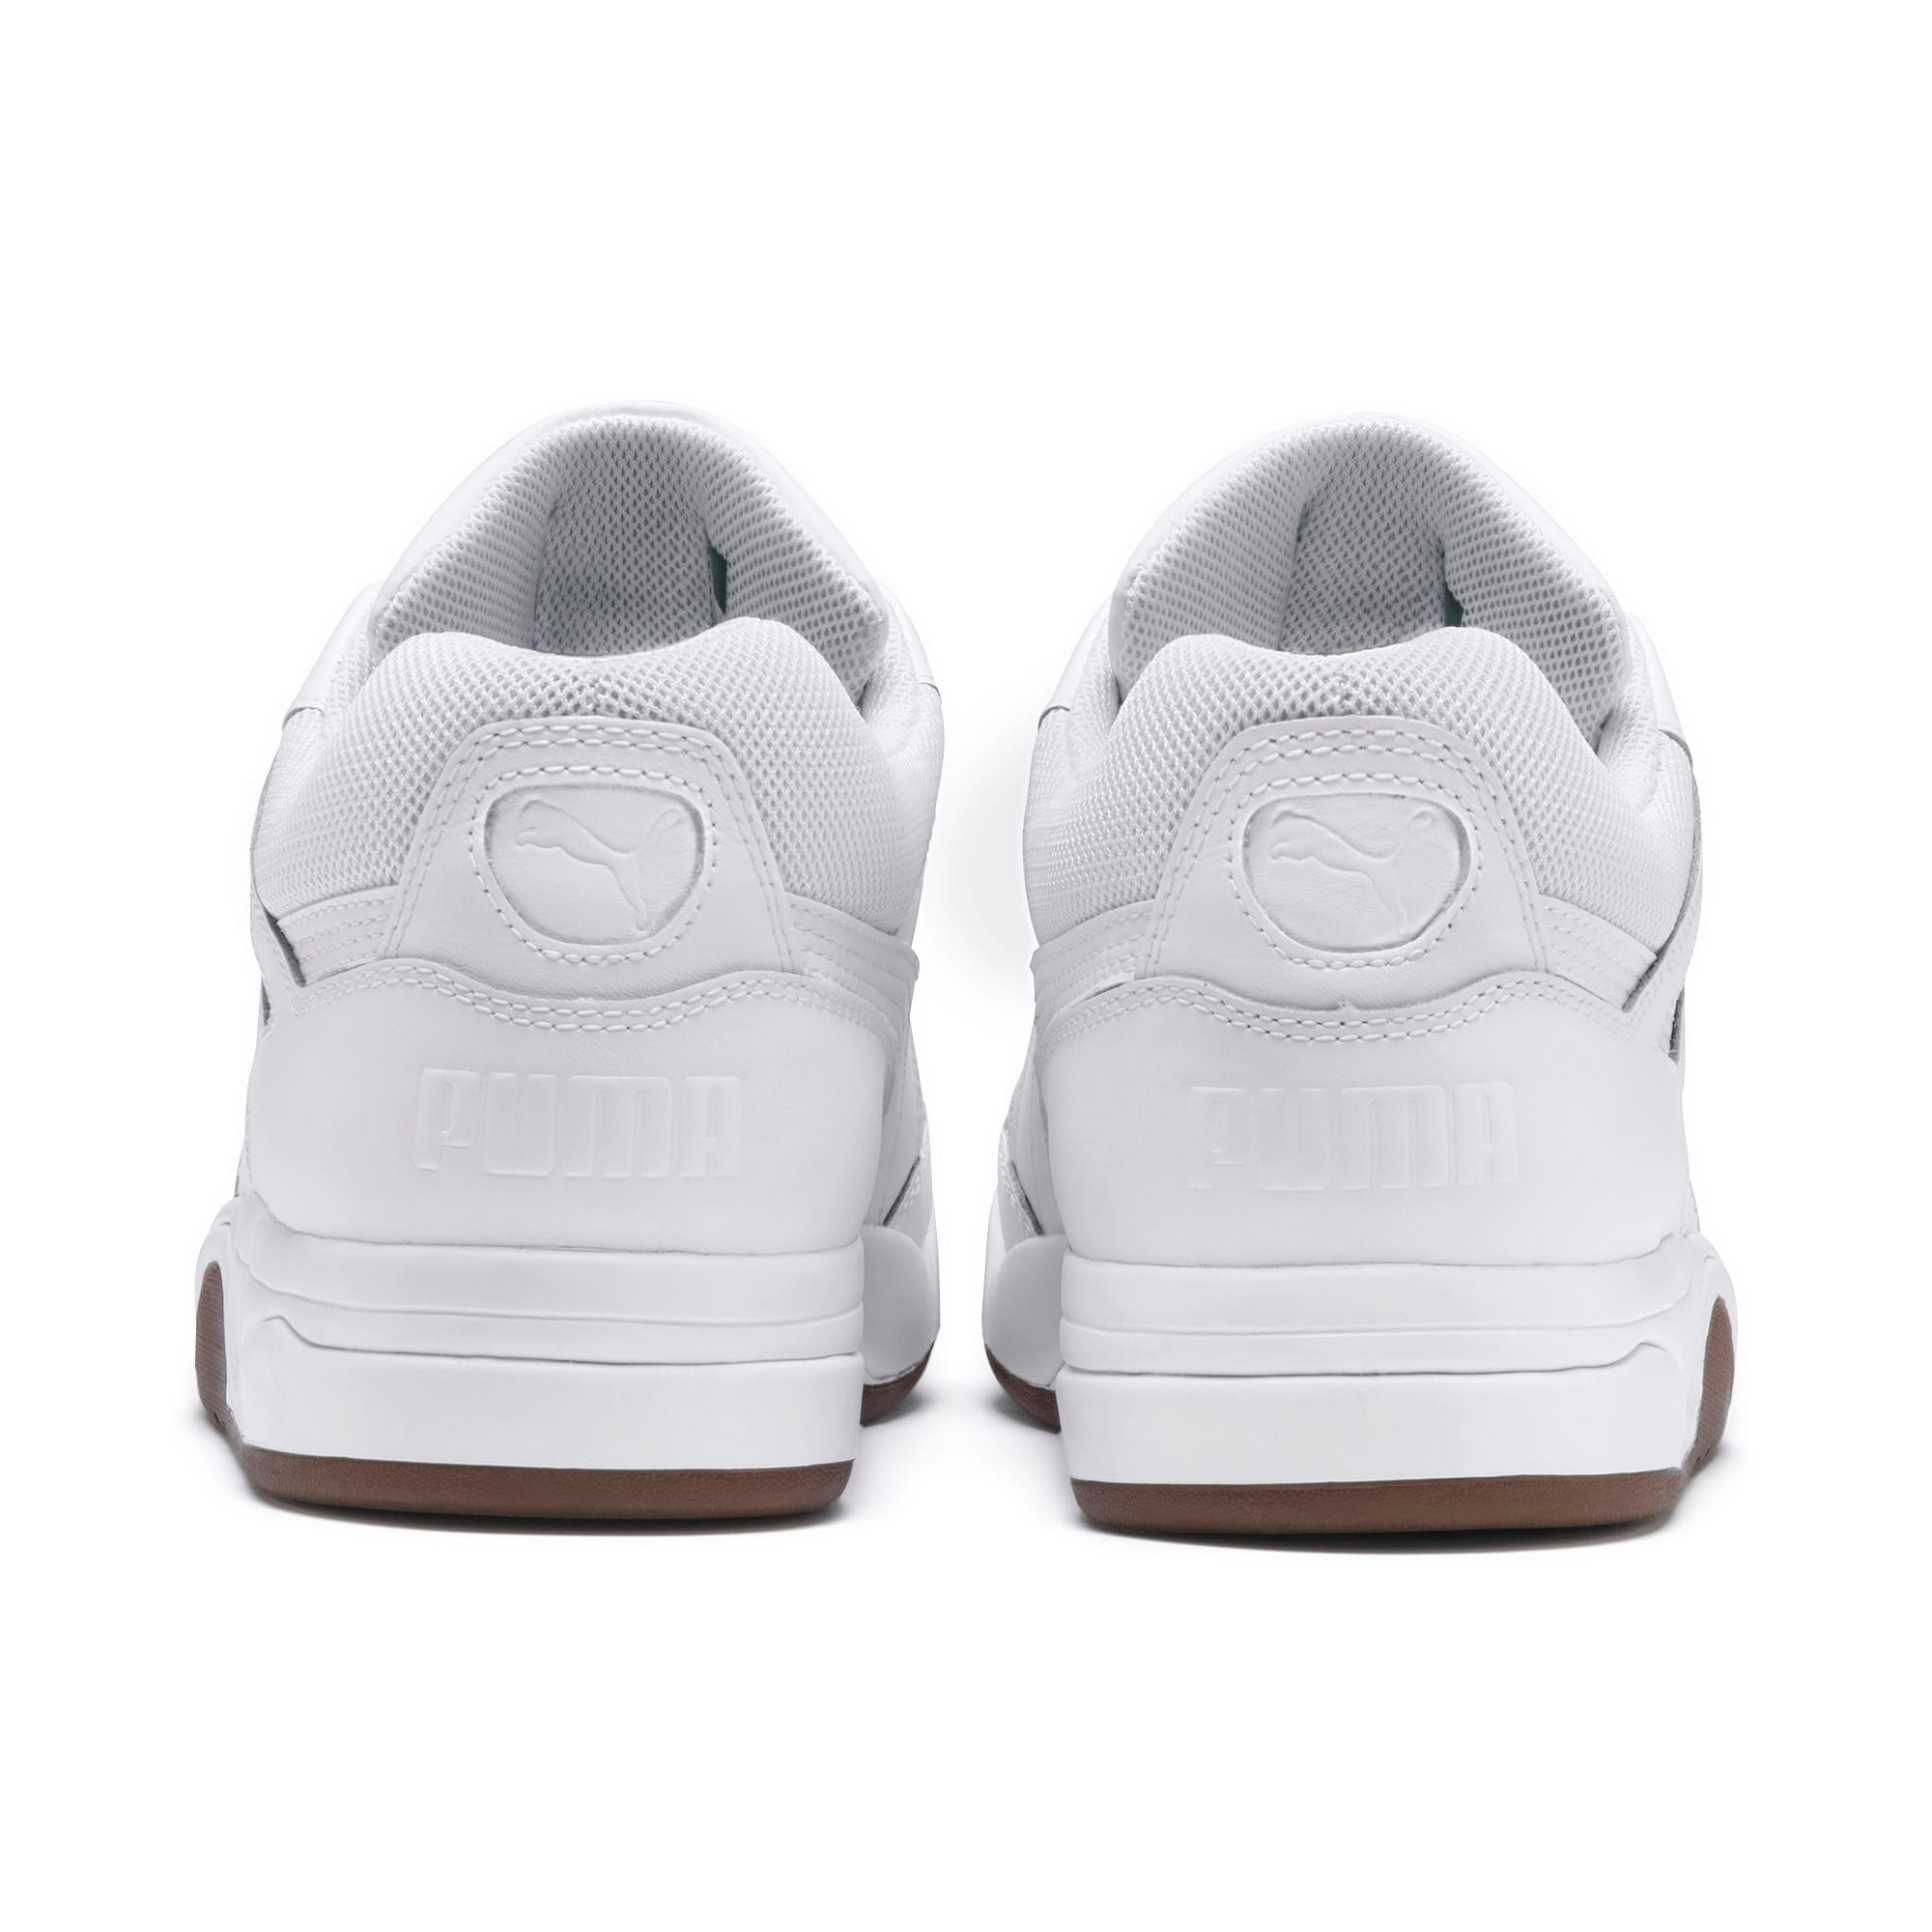 Thumbnail 3 of Palace Guard Sneakers, Puma White-Puma White-Gum, medium